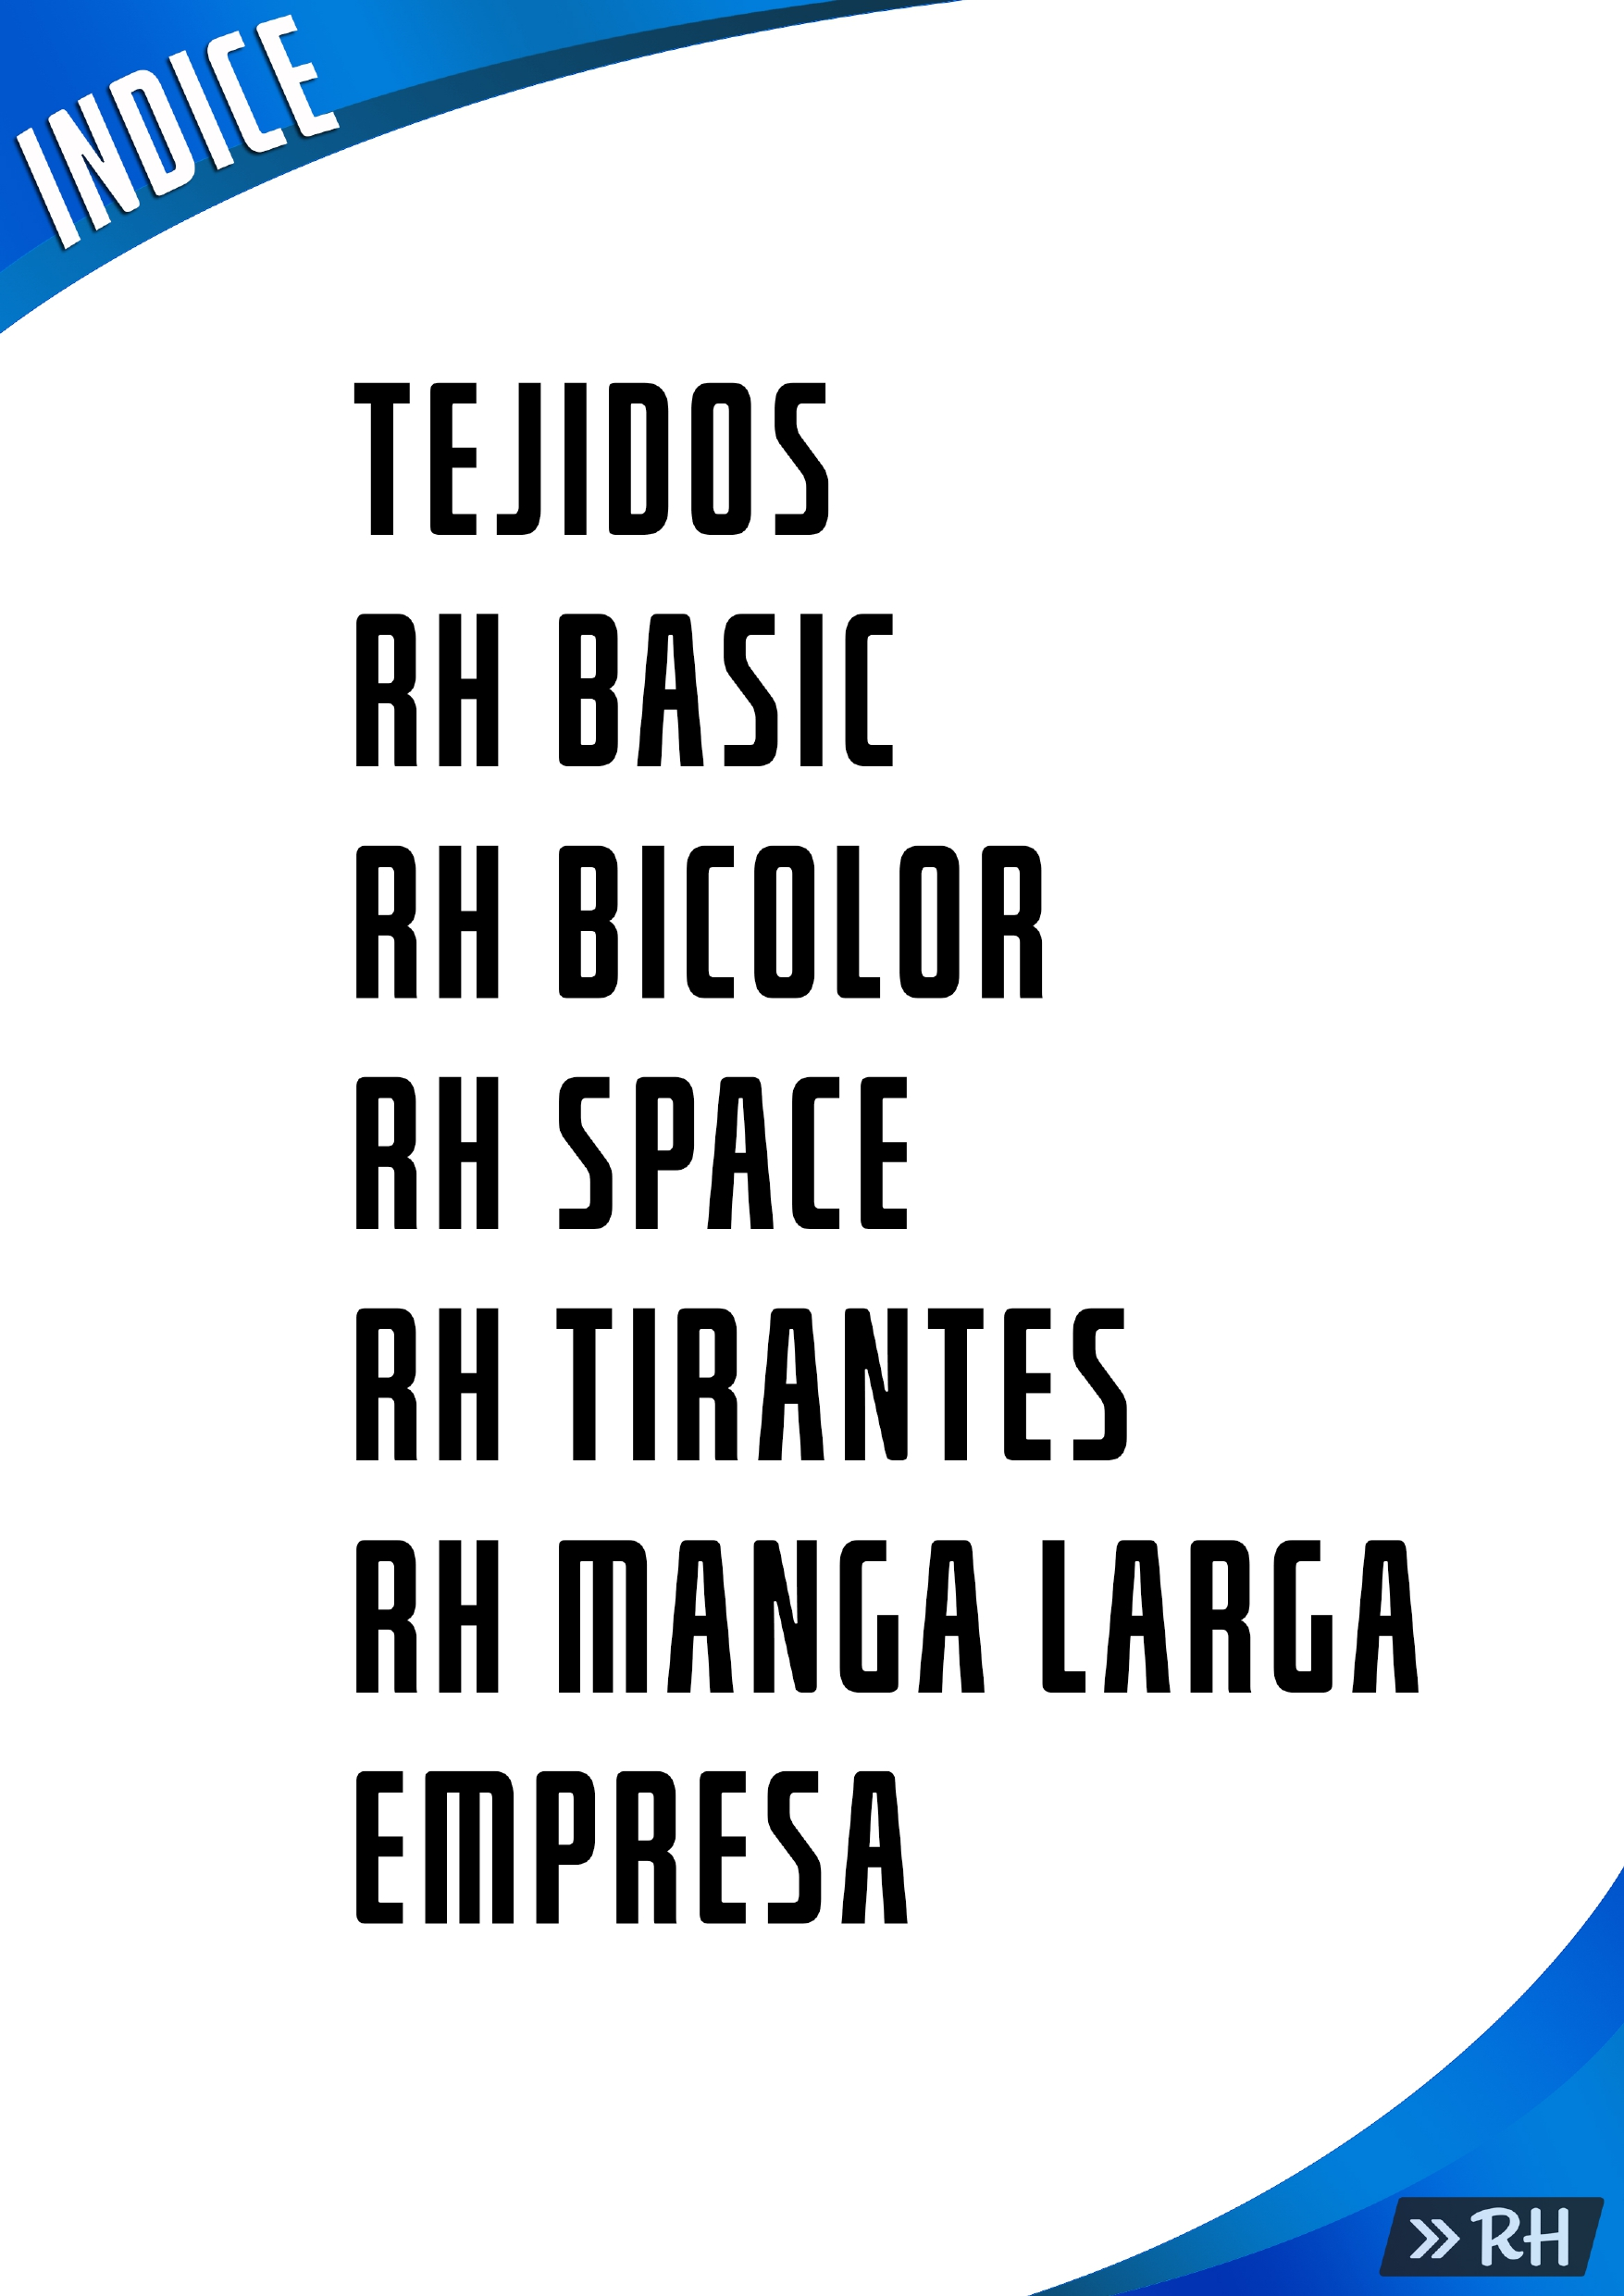 Camisetas tecnicas RH (2020)_page-0003